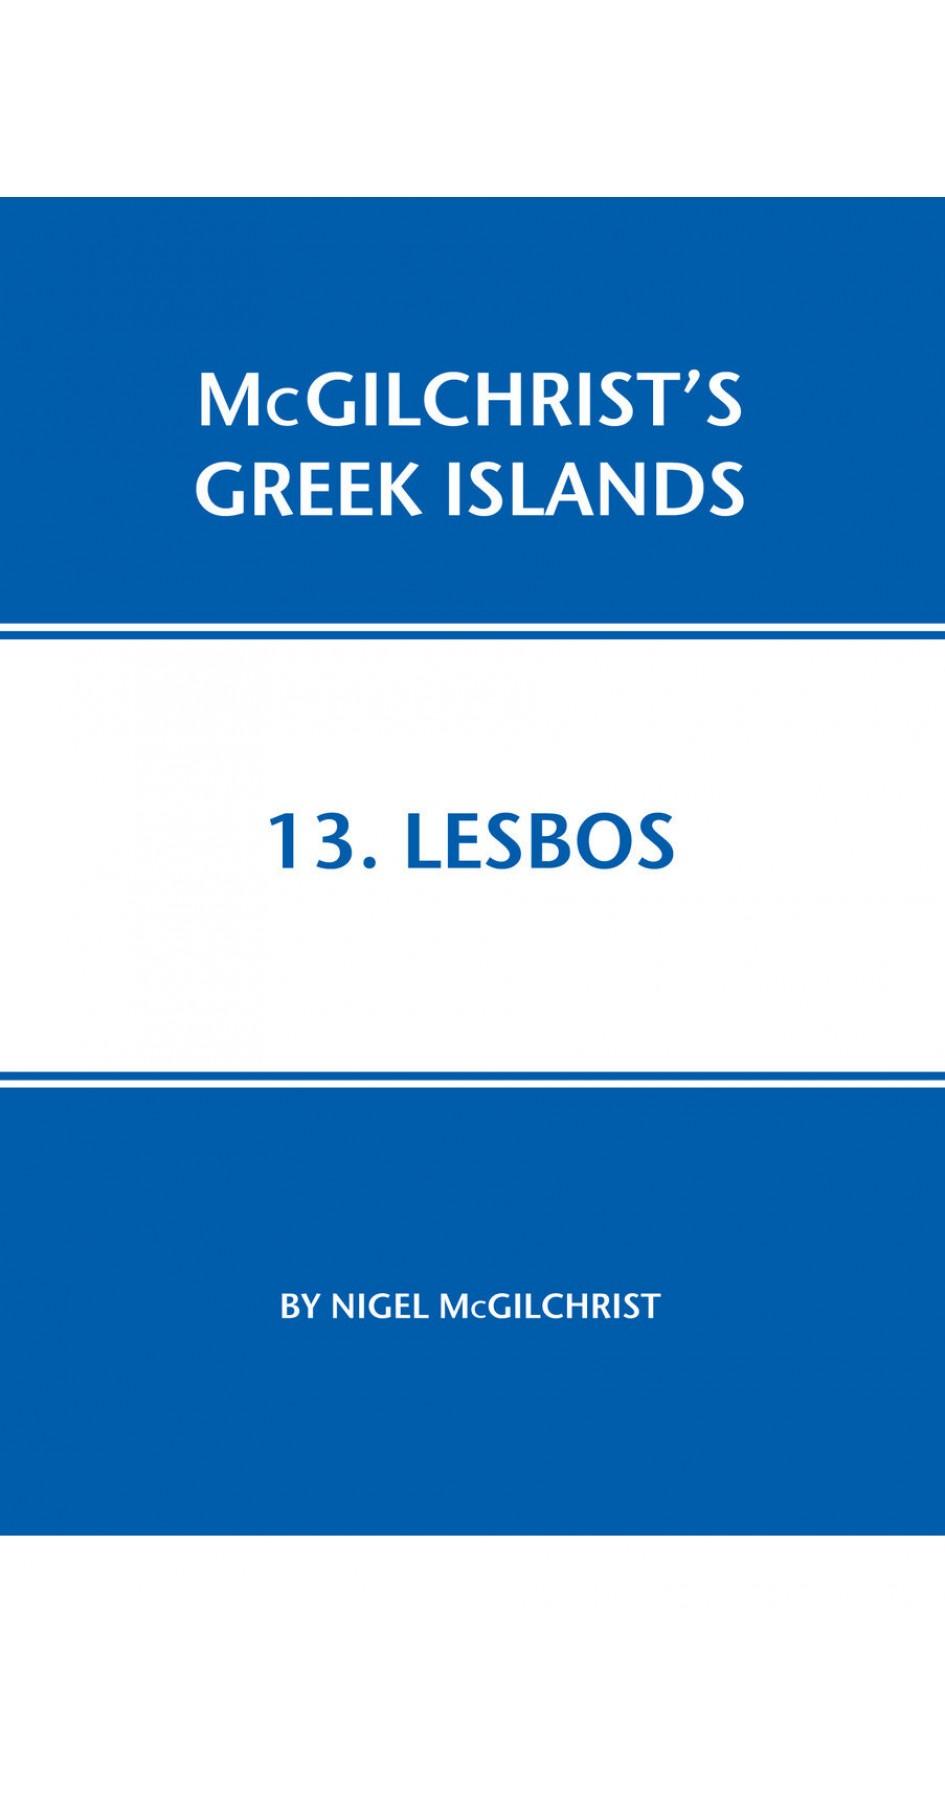 13. Lesbos - McGilchrist's Greek Islands